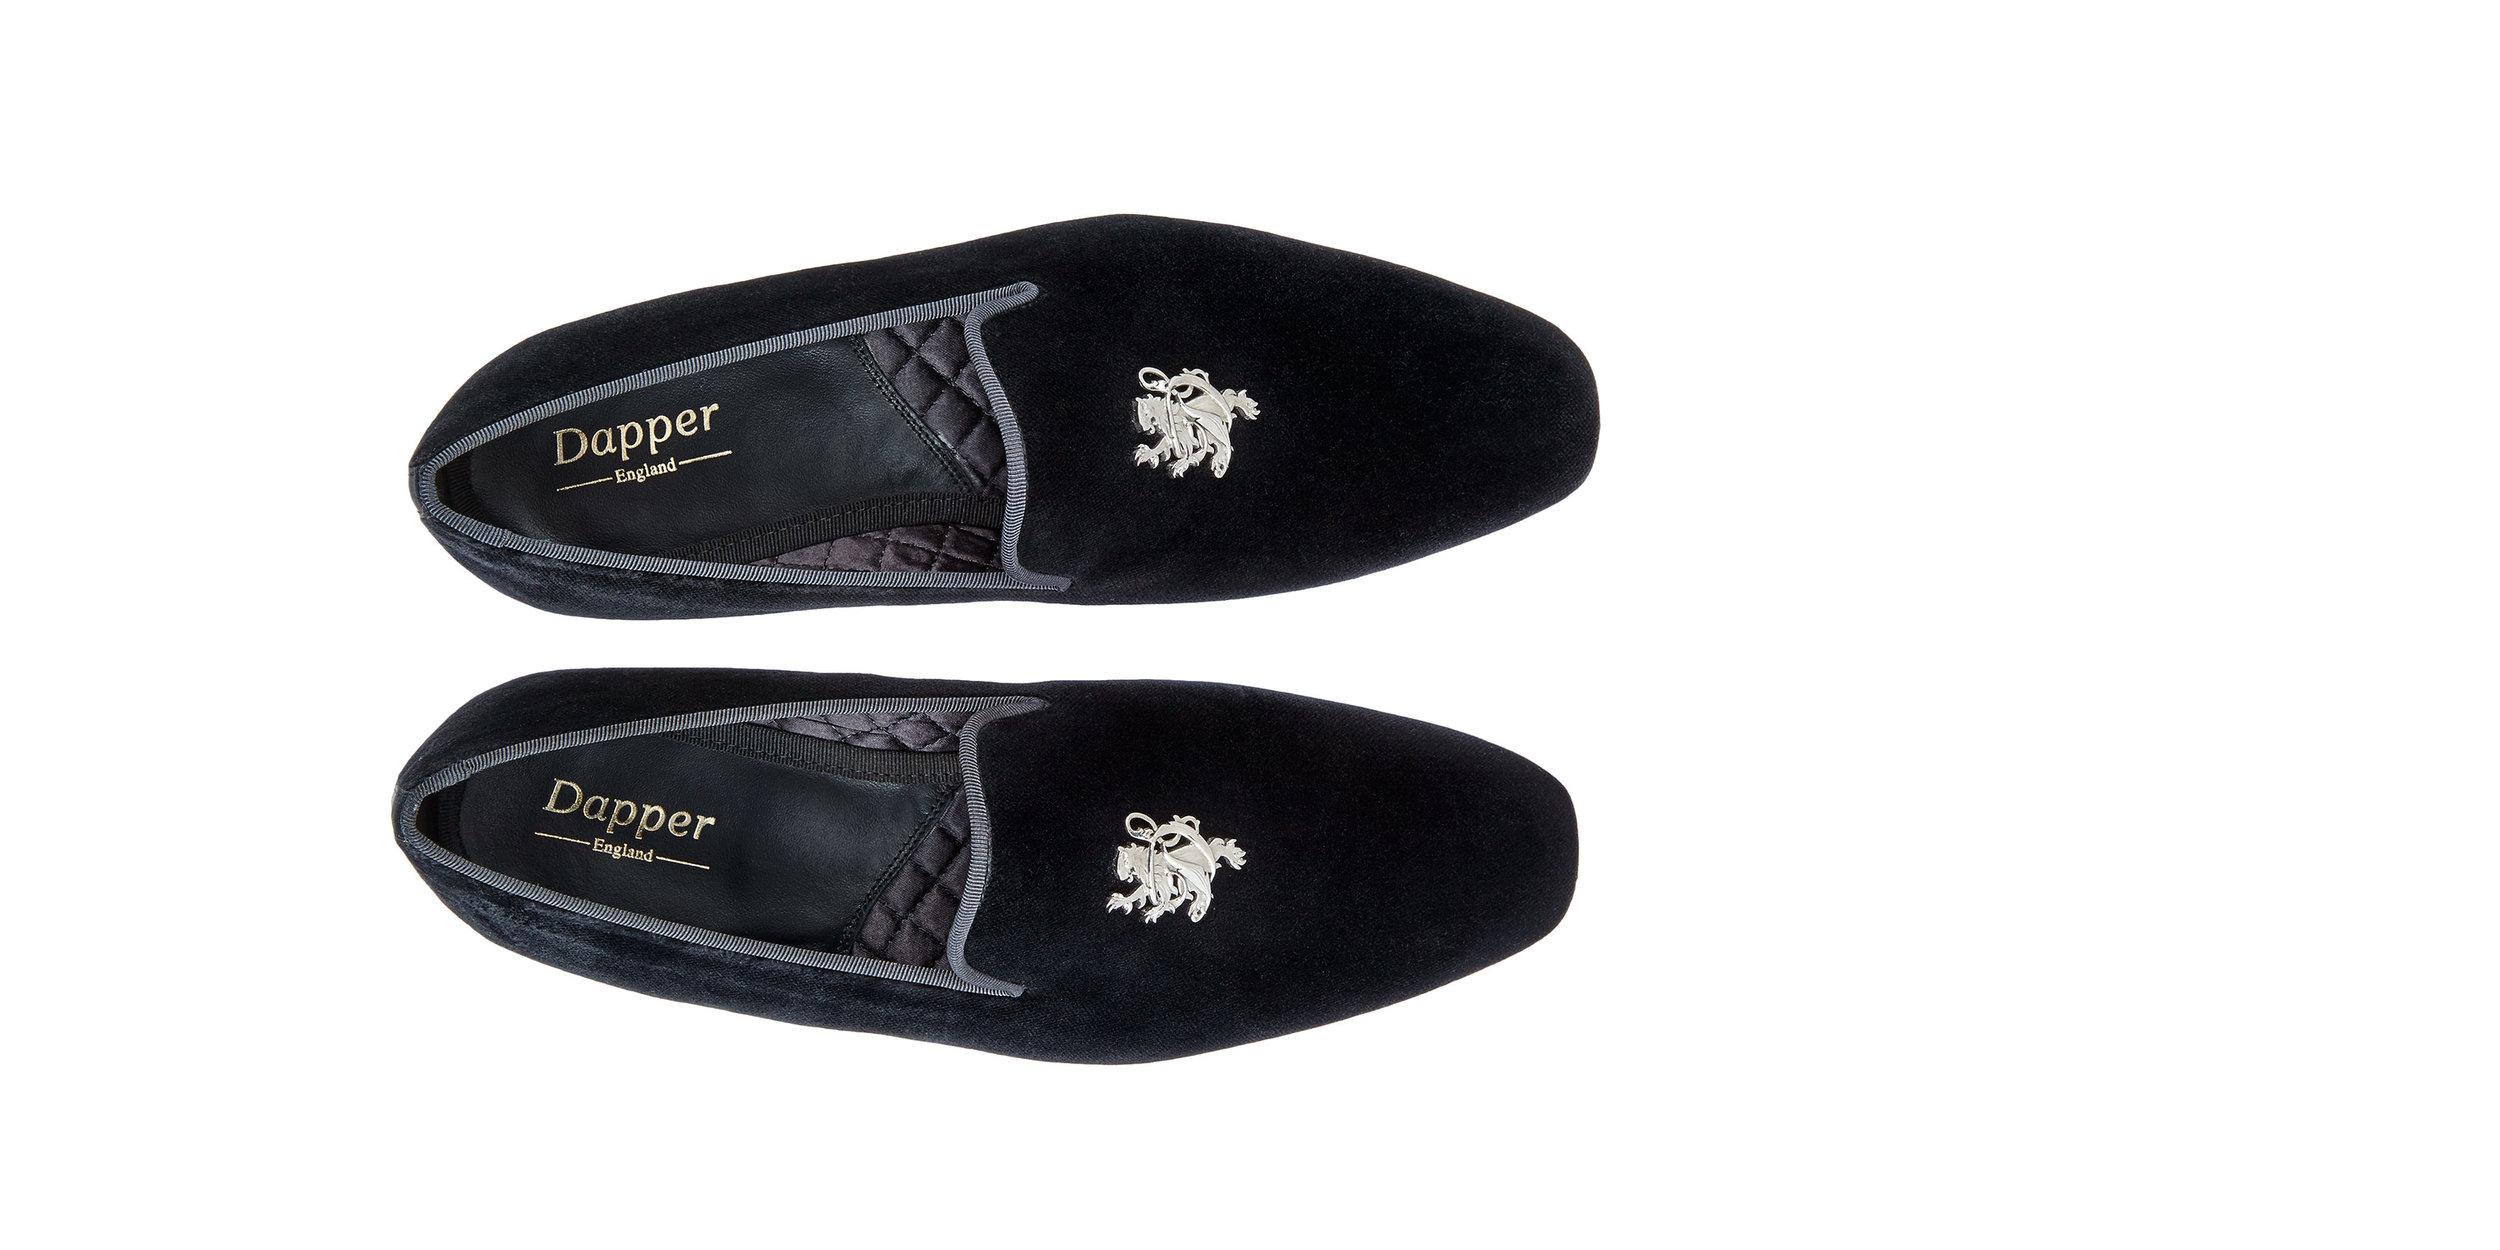 Dapper England Footwear